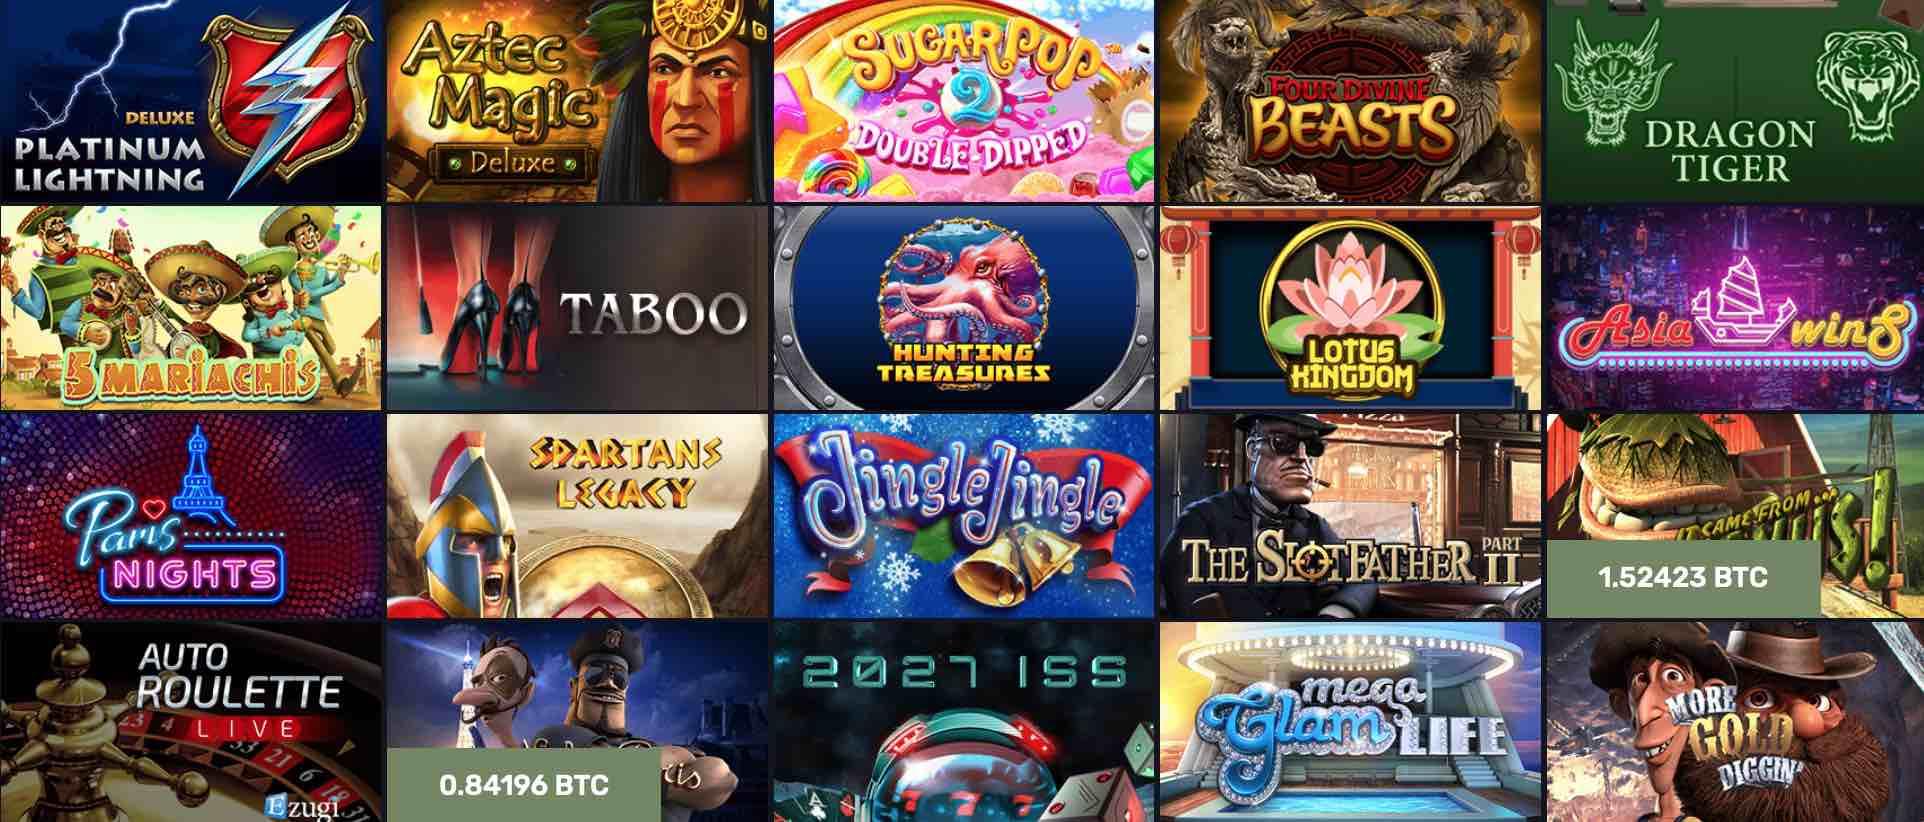 Club vegas casino arcade